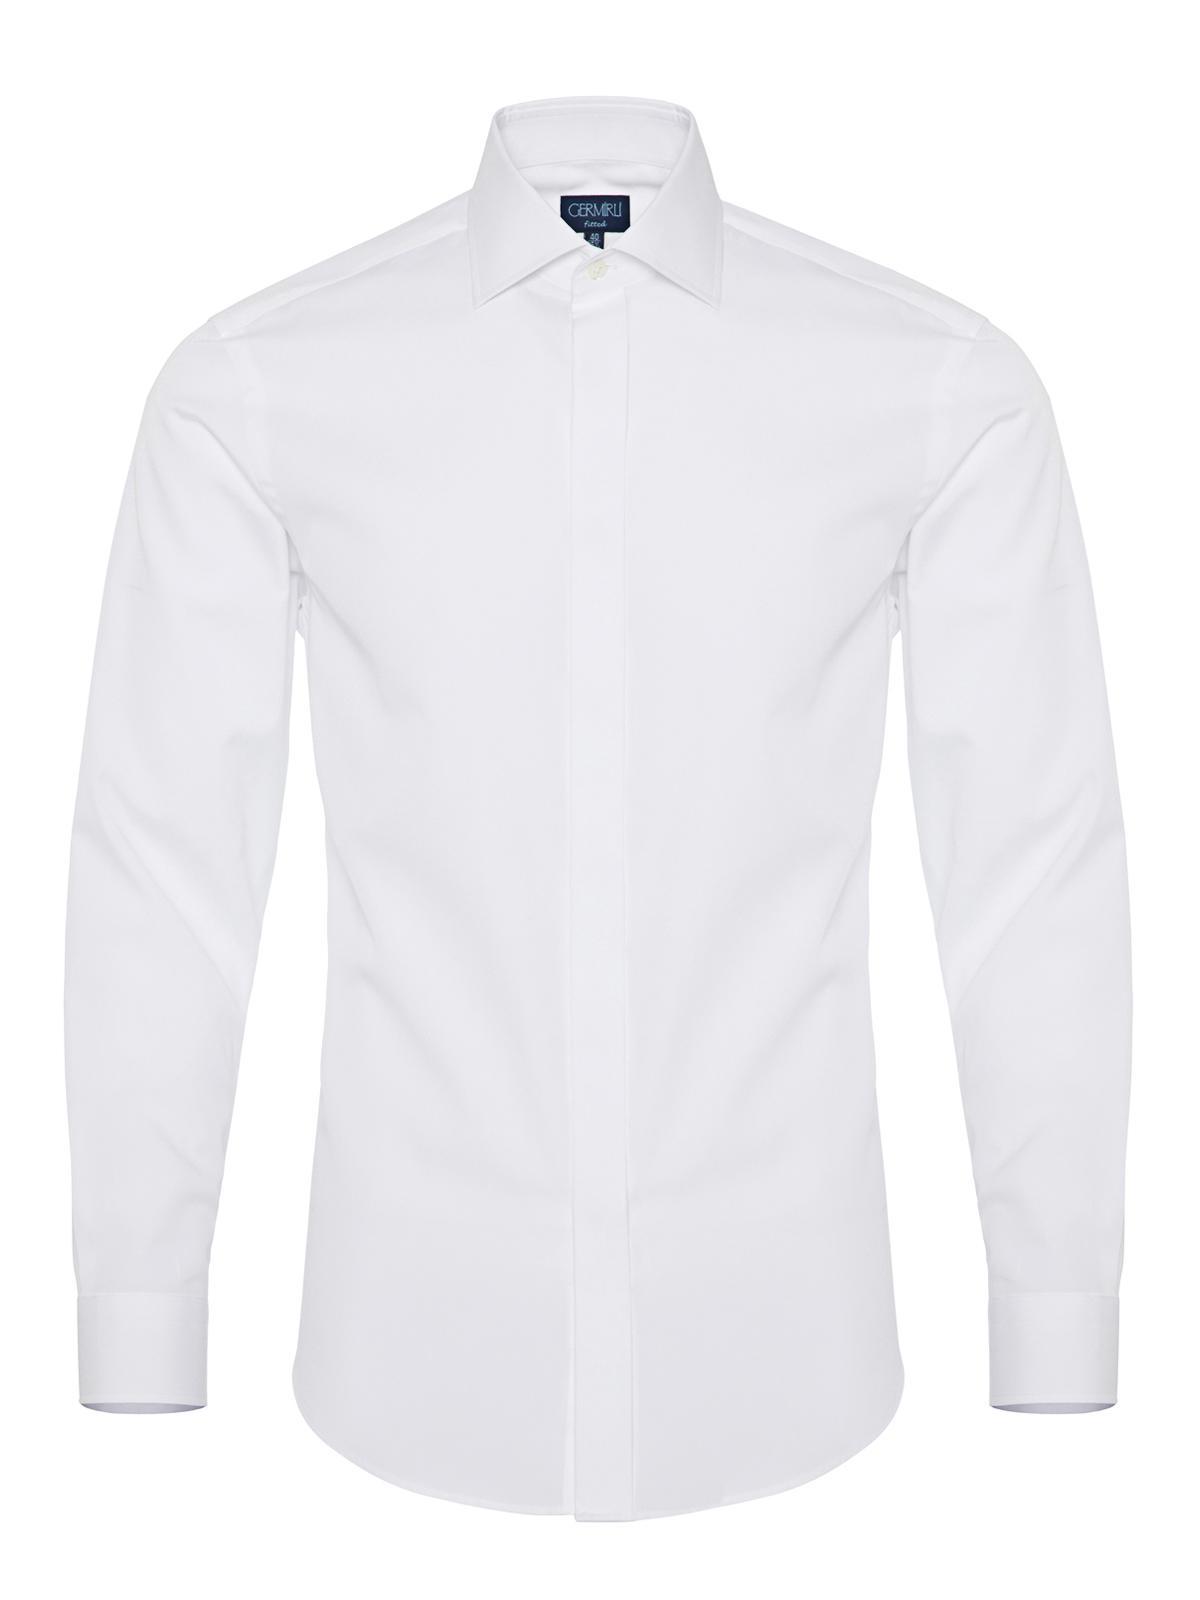 Germirli White Semi Spread Tailor Fit Shirt